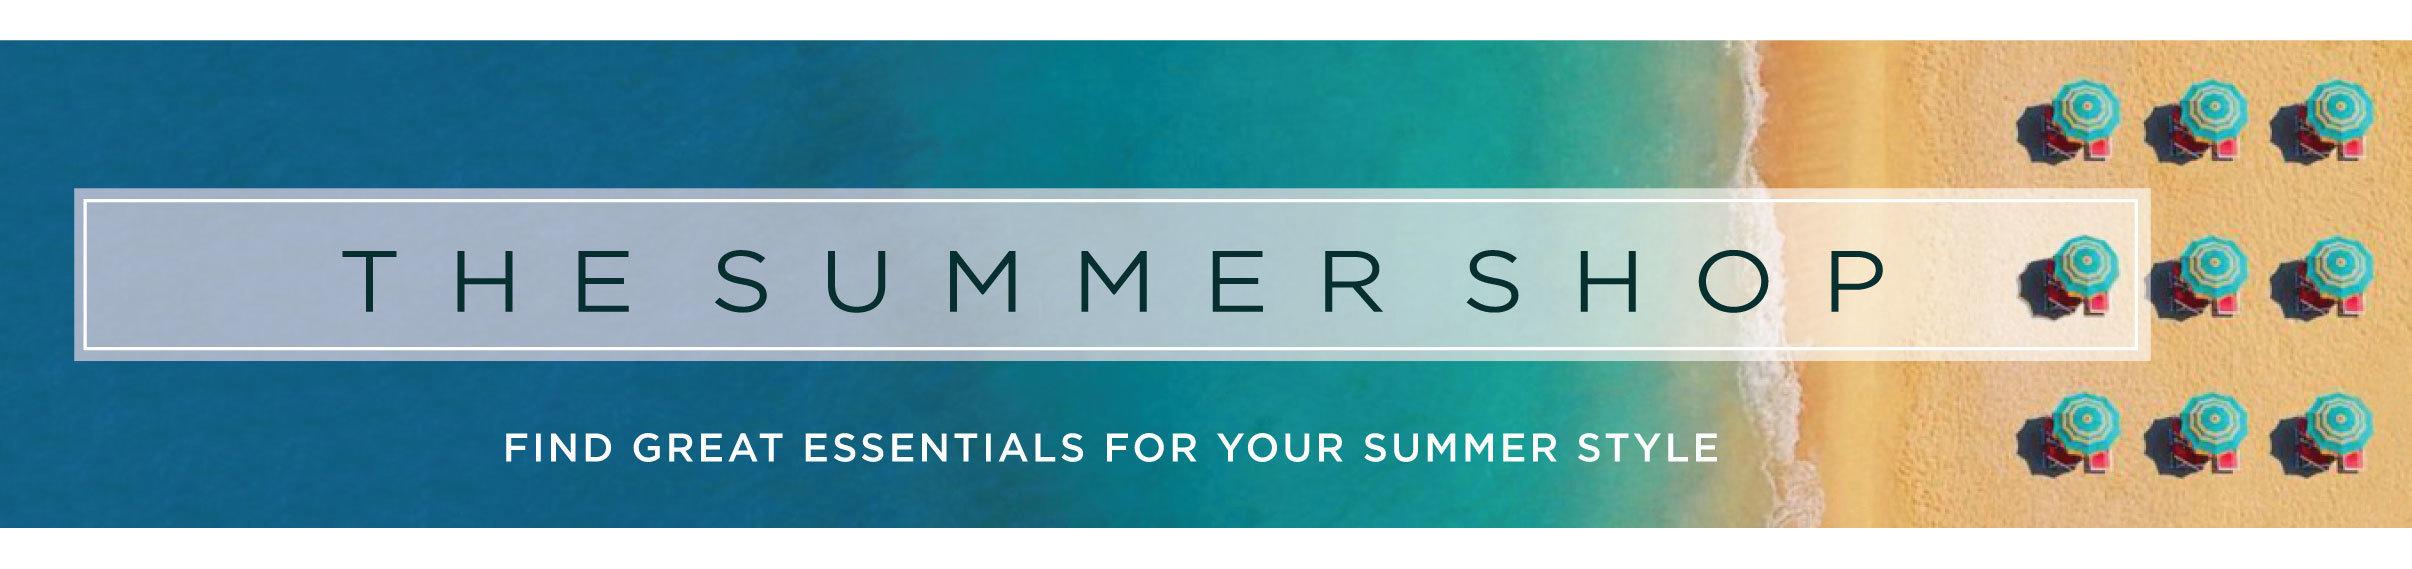 The Summer Shop